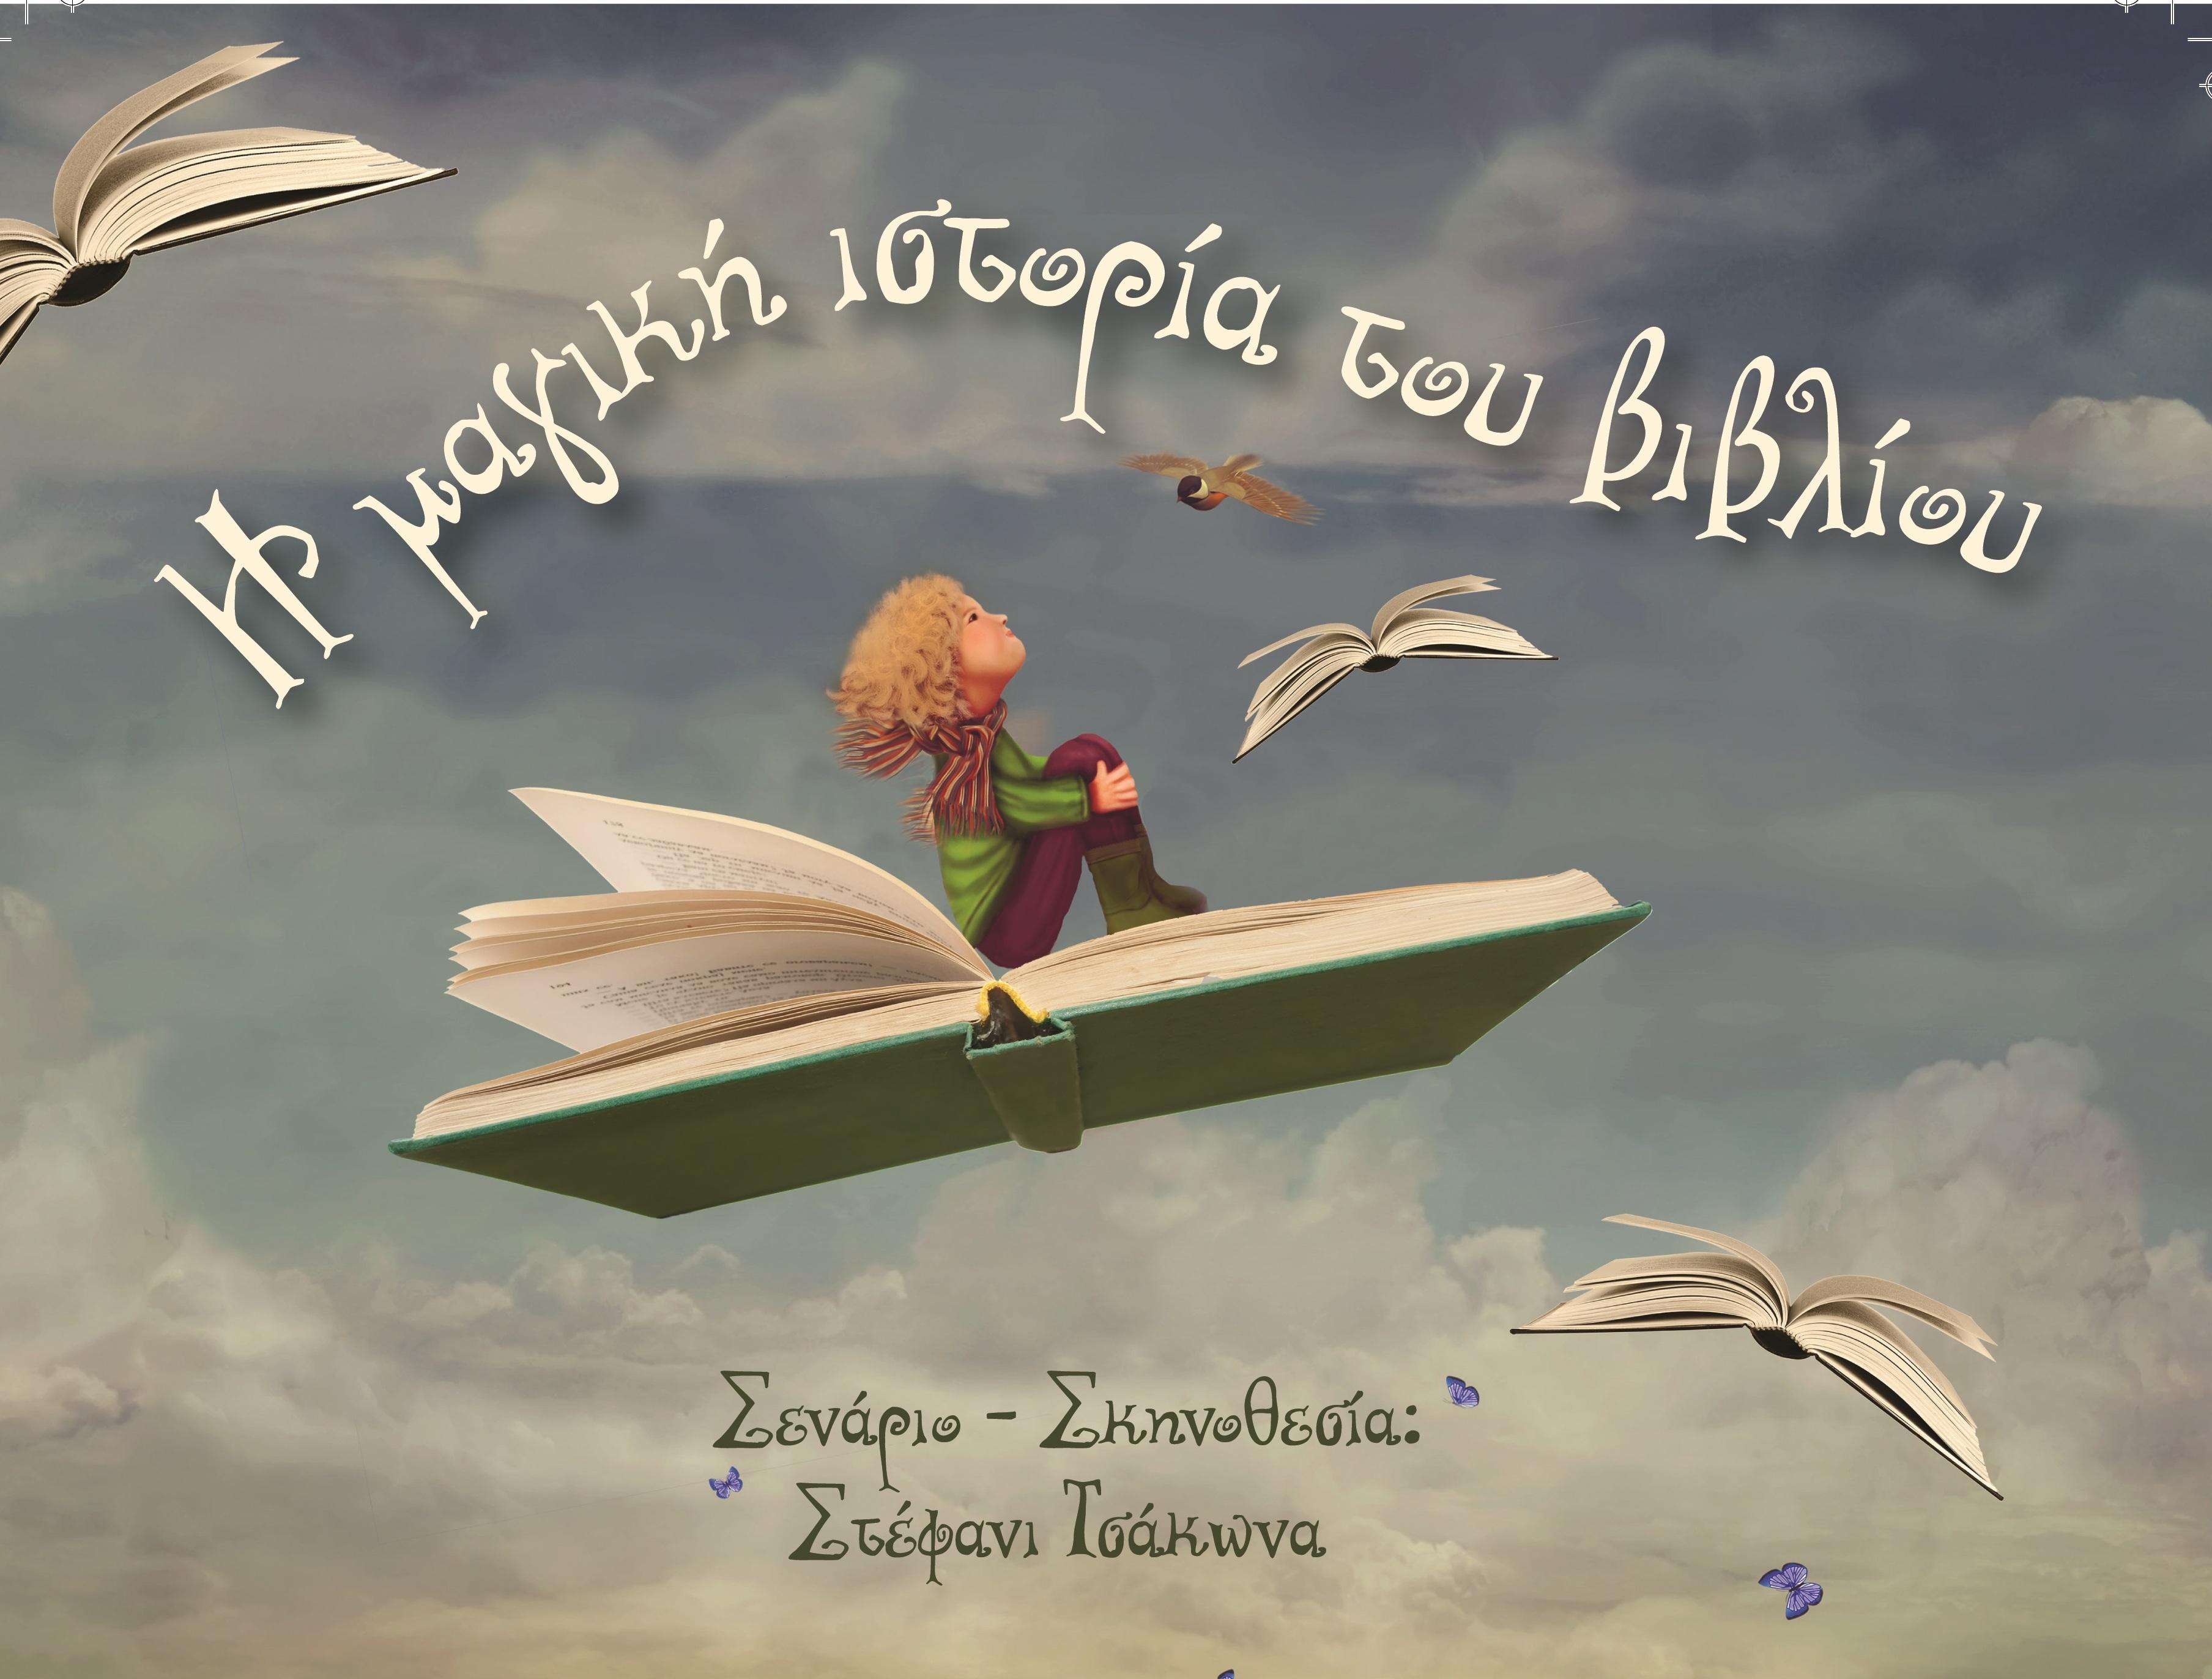 H μαγική ιστορία του βιβλίου: από τον πάπυρο στα e-books